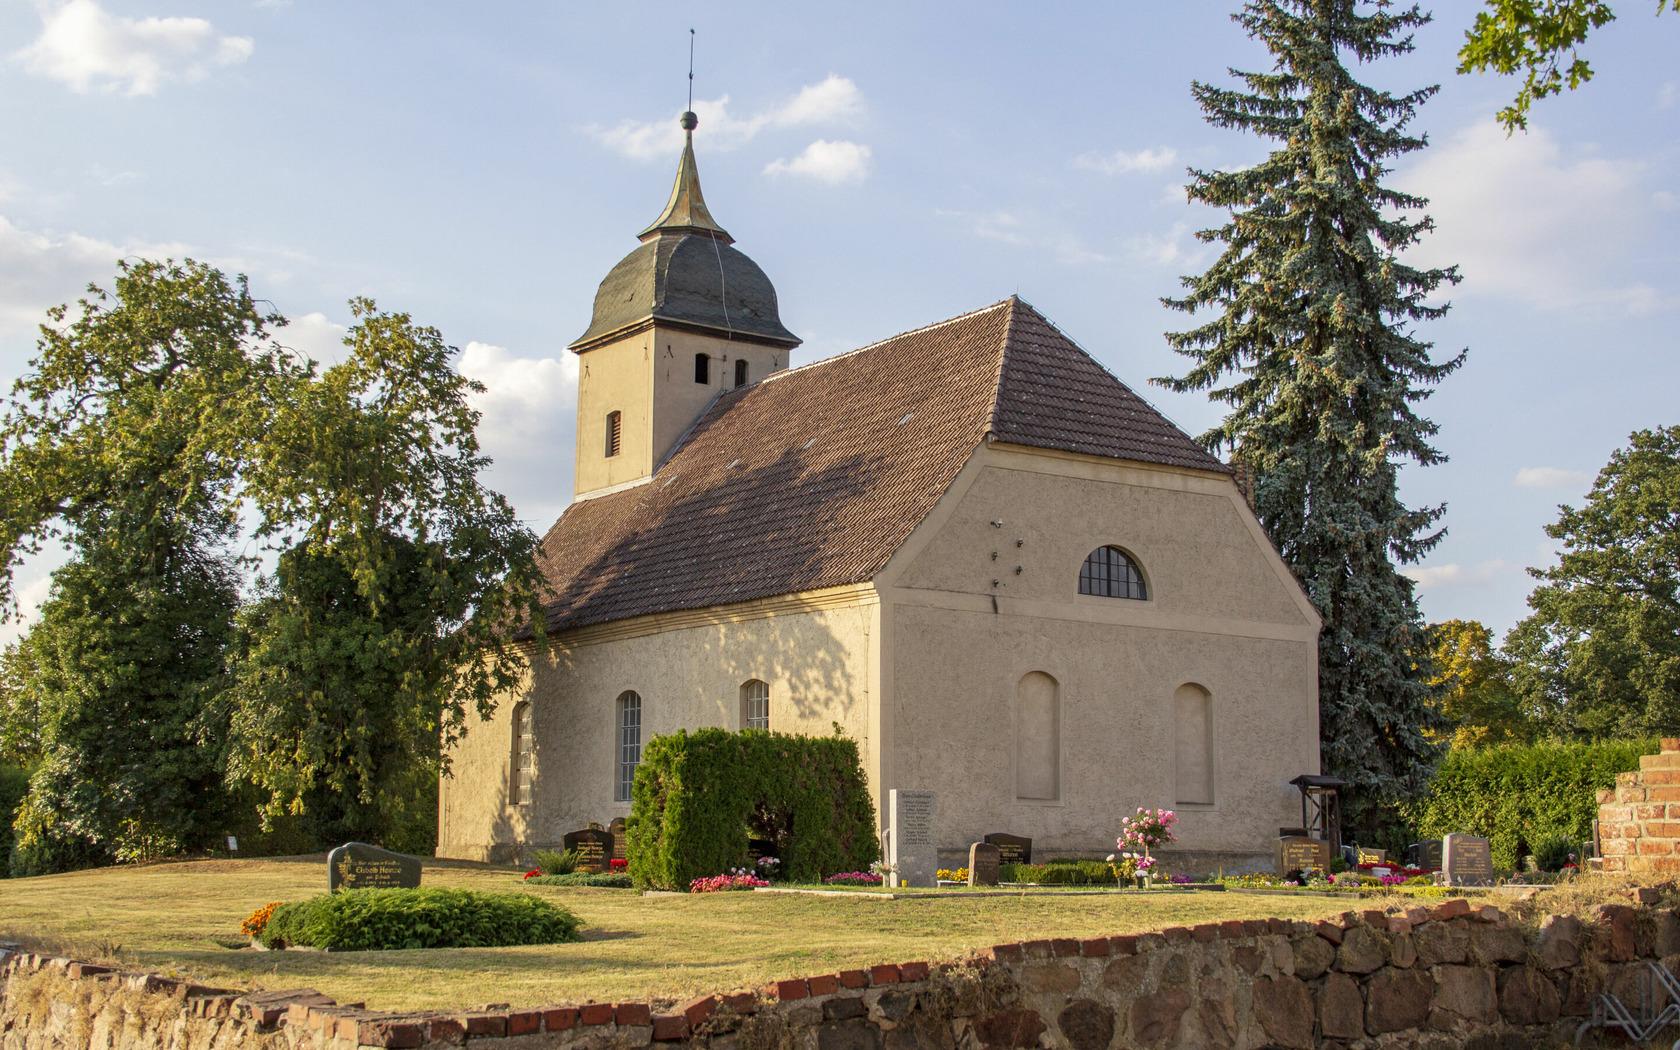 Kirche Sembten, Foto: TMB-Fotoarchiv/ScottyScout